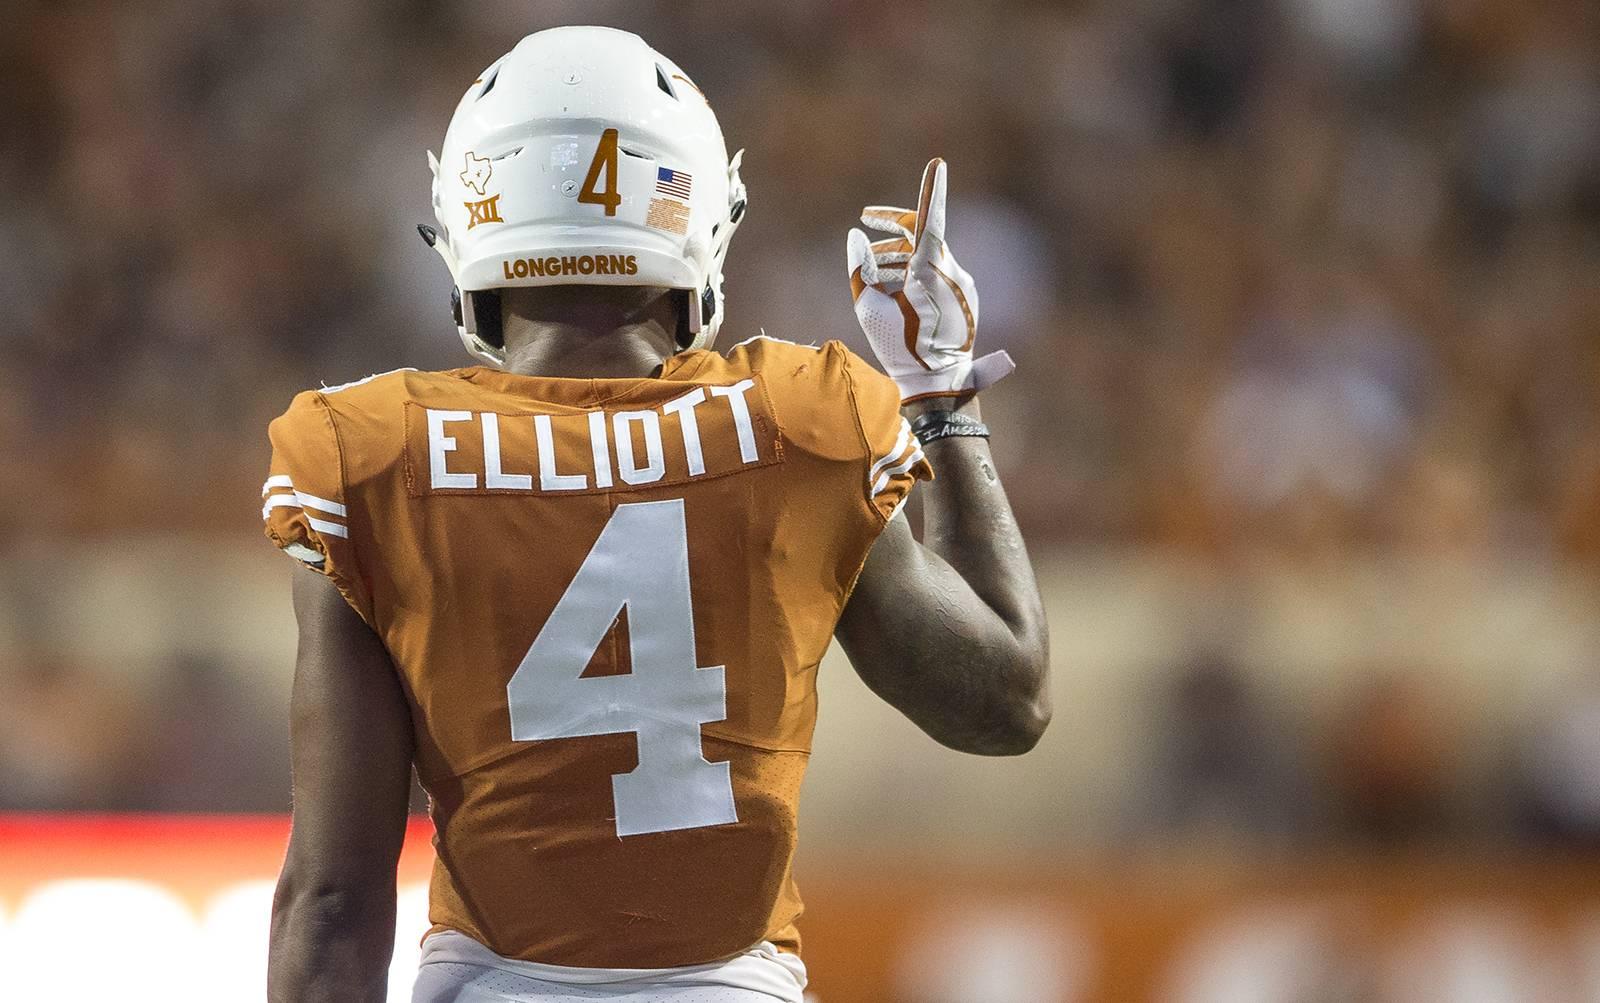 DeShon Elliott apparently suffers fractured forearm | Hookem.com